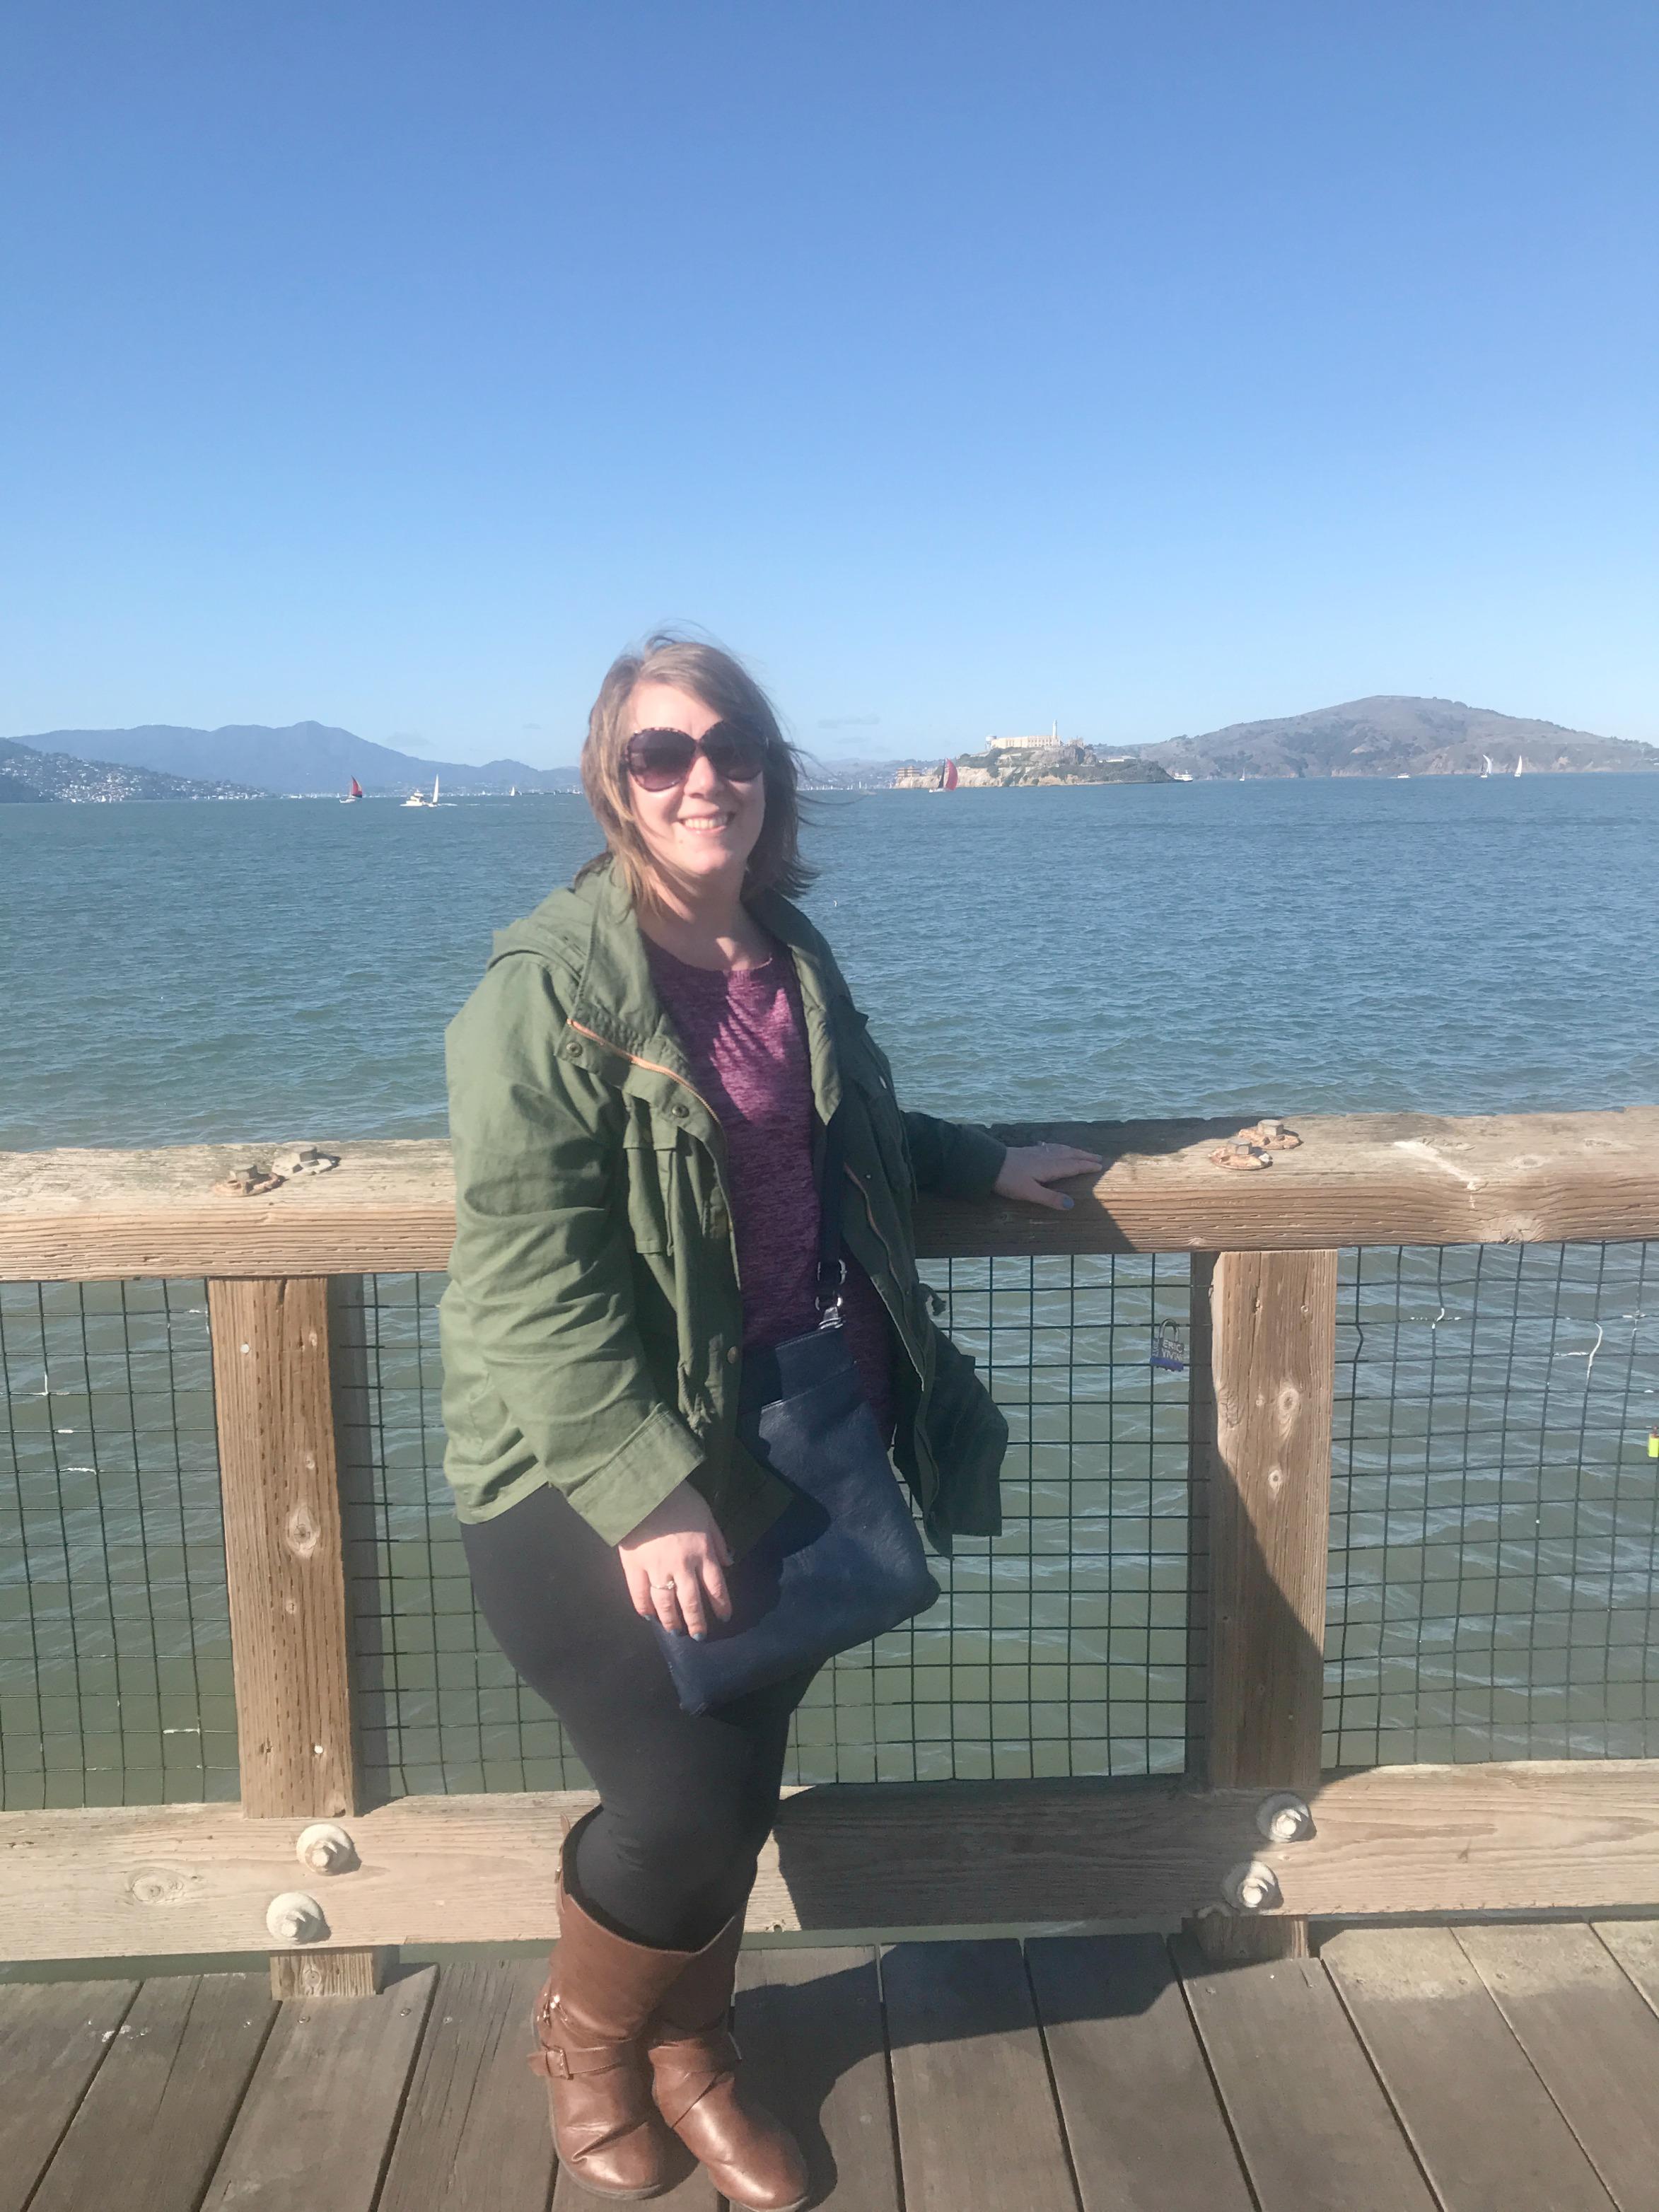 Pier 39 San Francisco, Fisherman's Wharf, Explore San Francisco in One Day